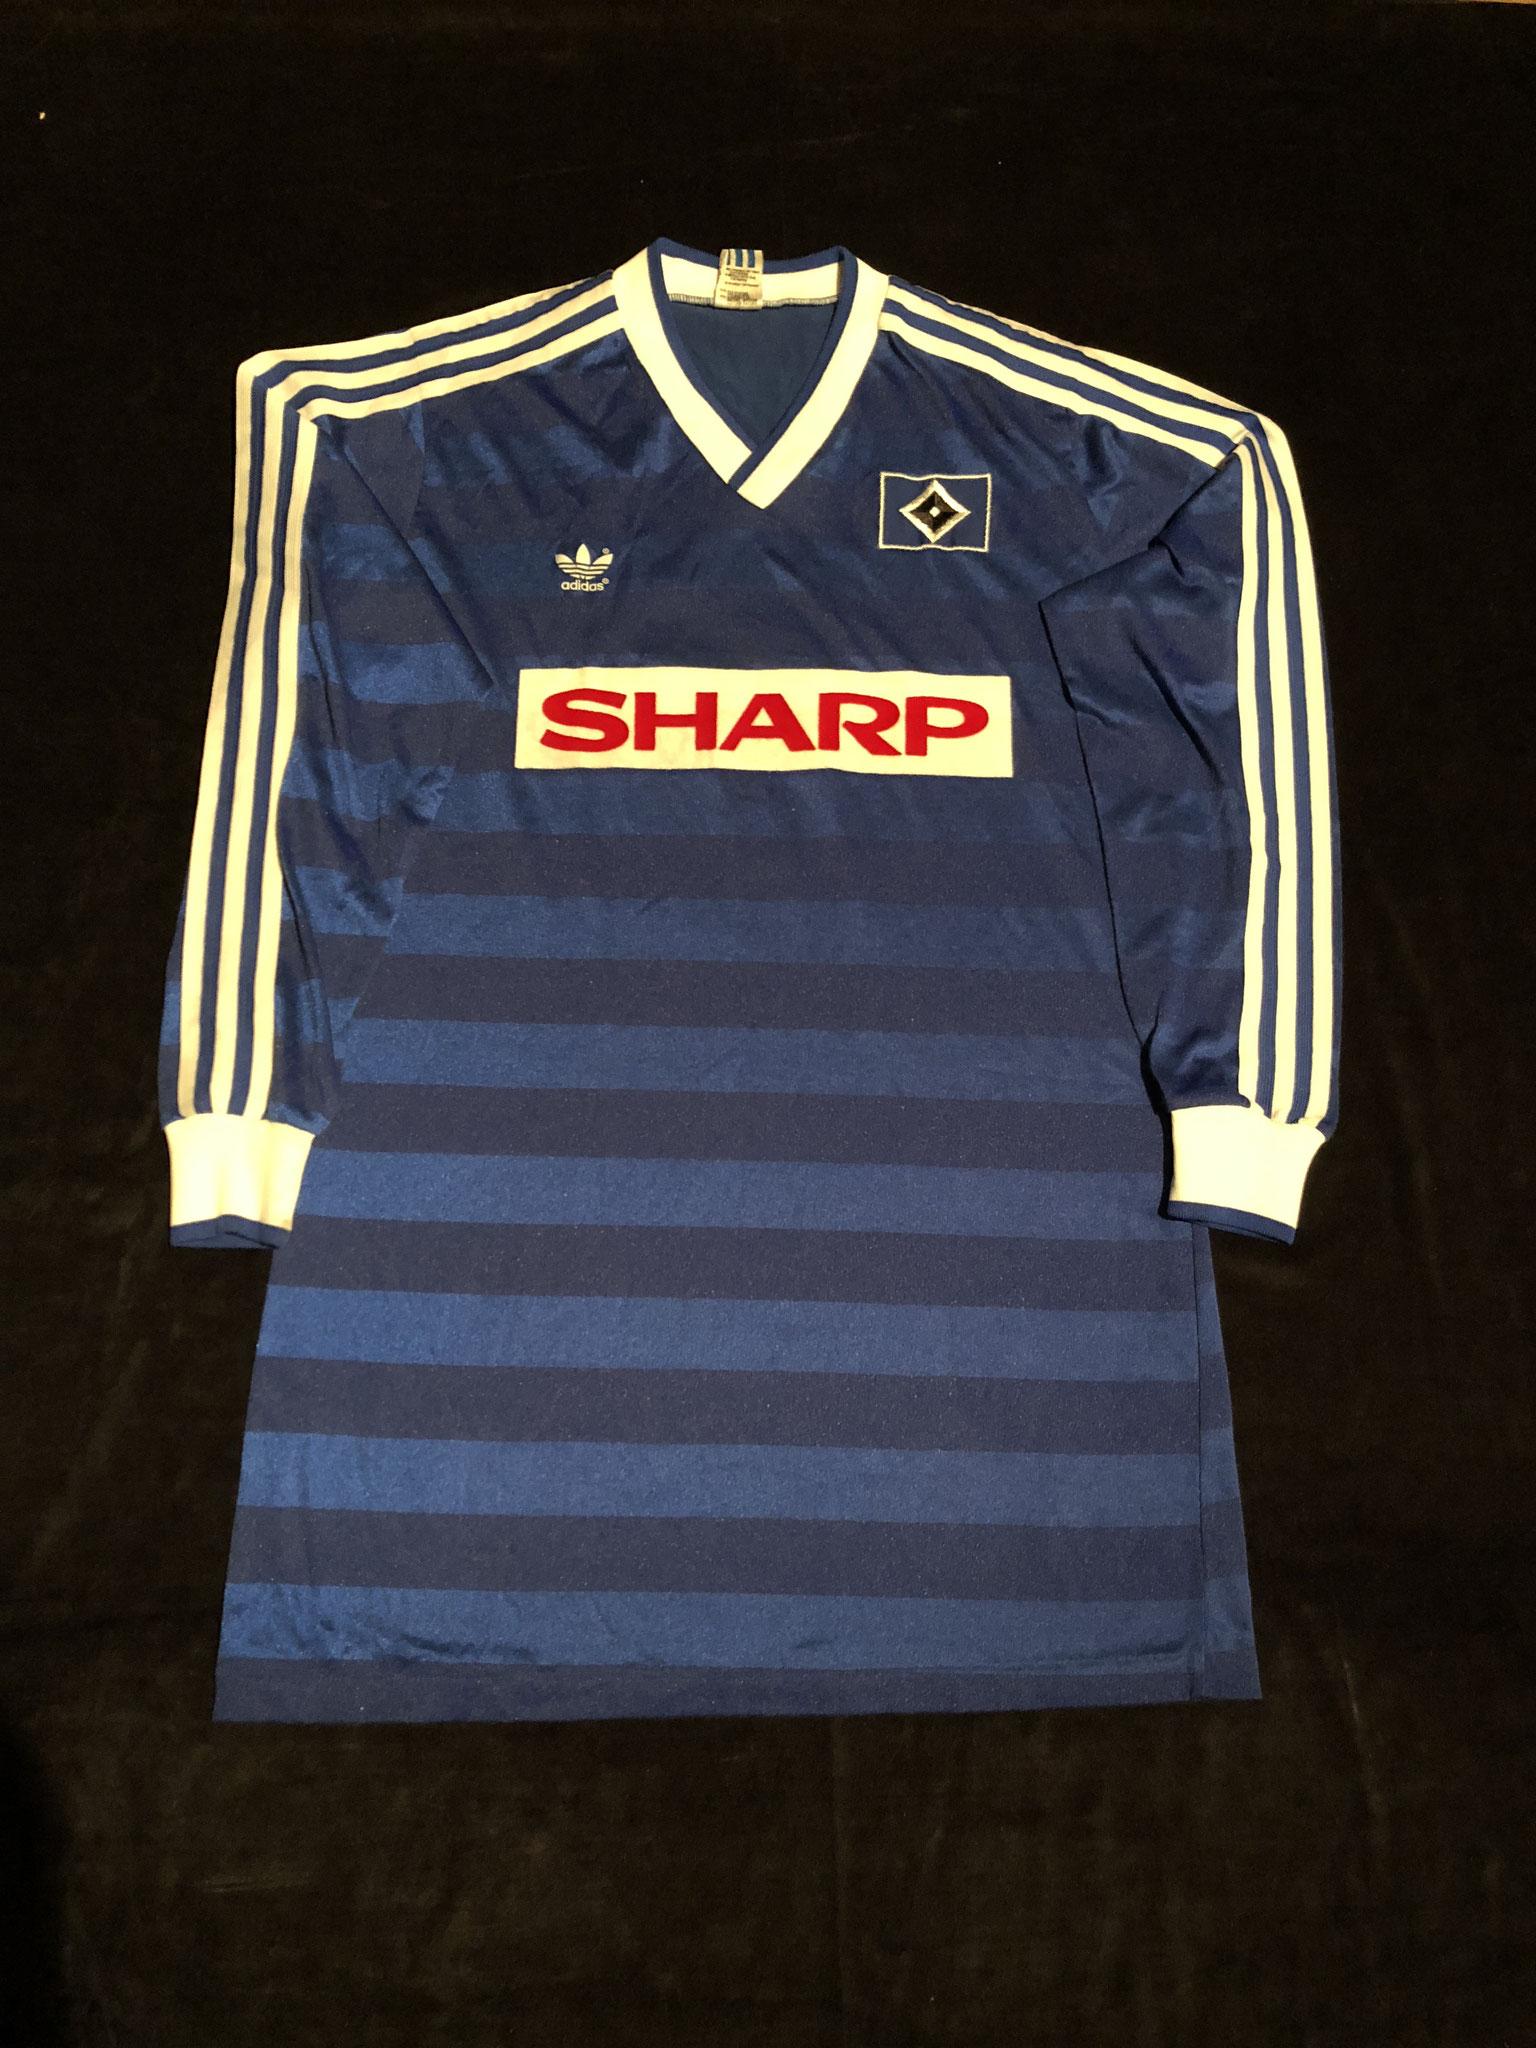 1987/88 - Europapokal der Pokalsieger